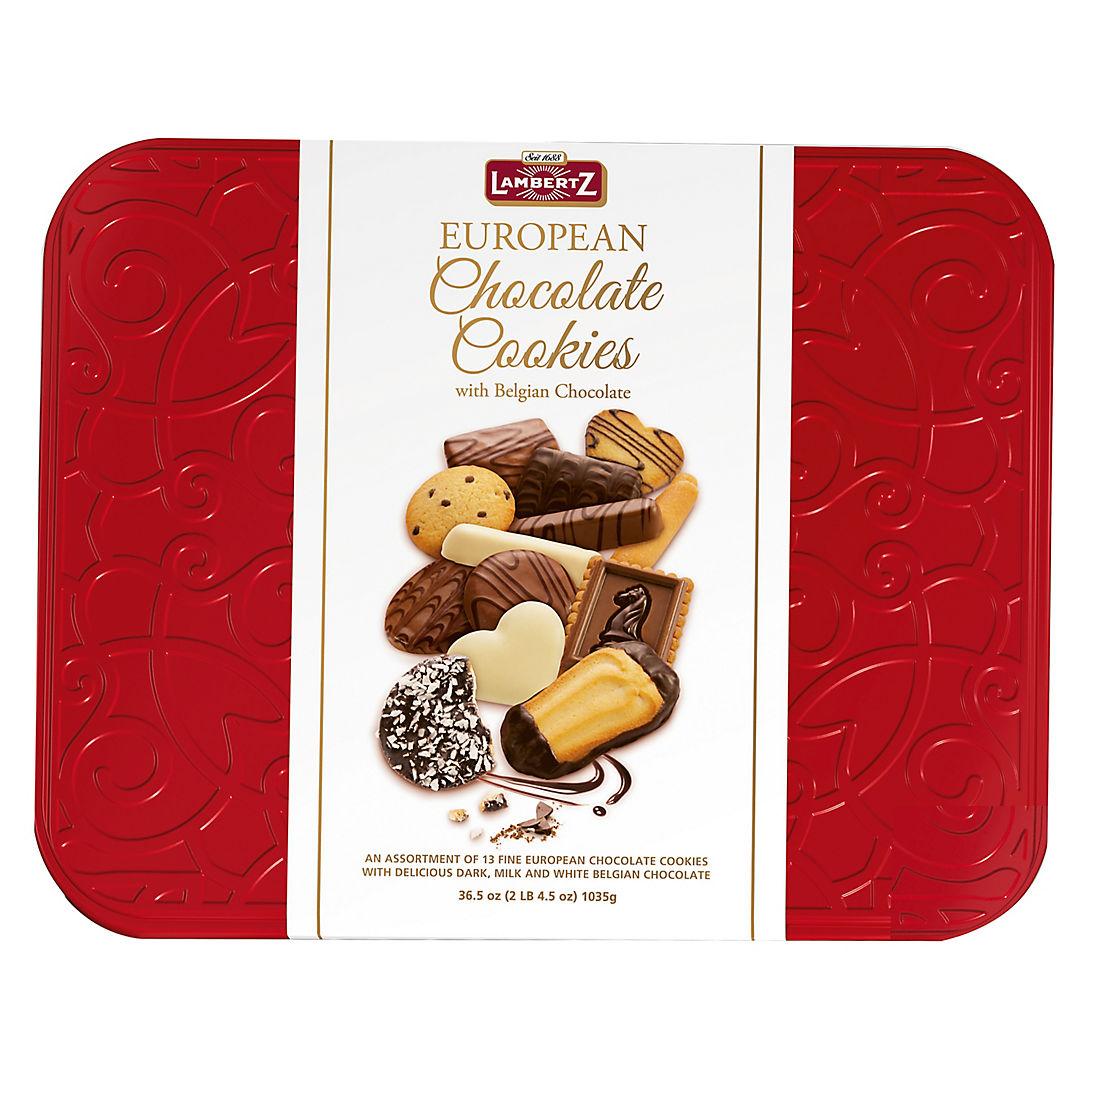 Lambertz European Chocolate Cookies Red Tin Bjs Wholesale Club